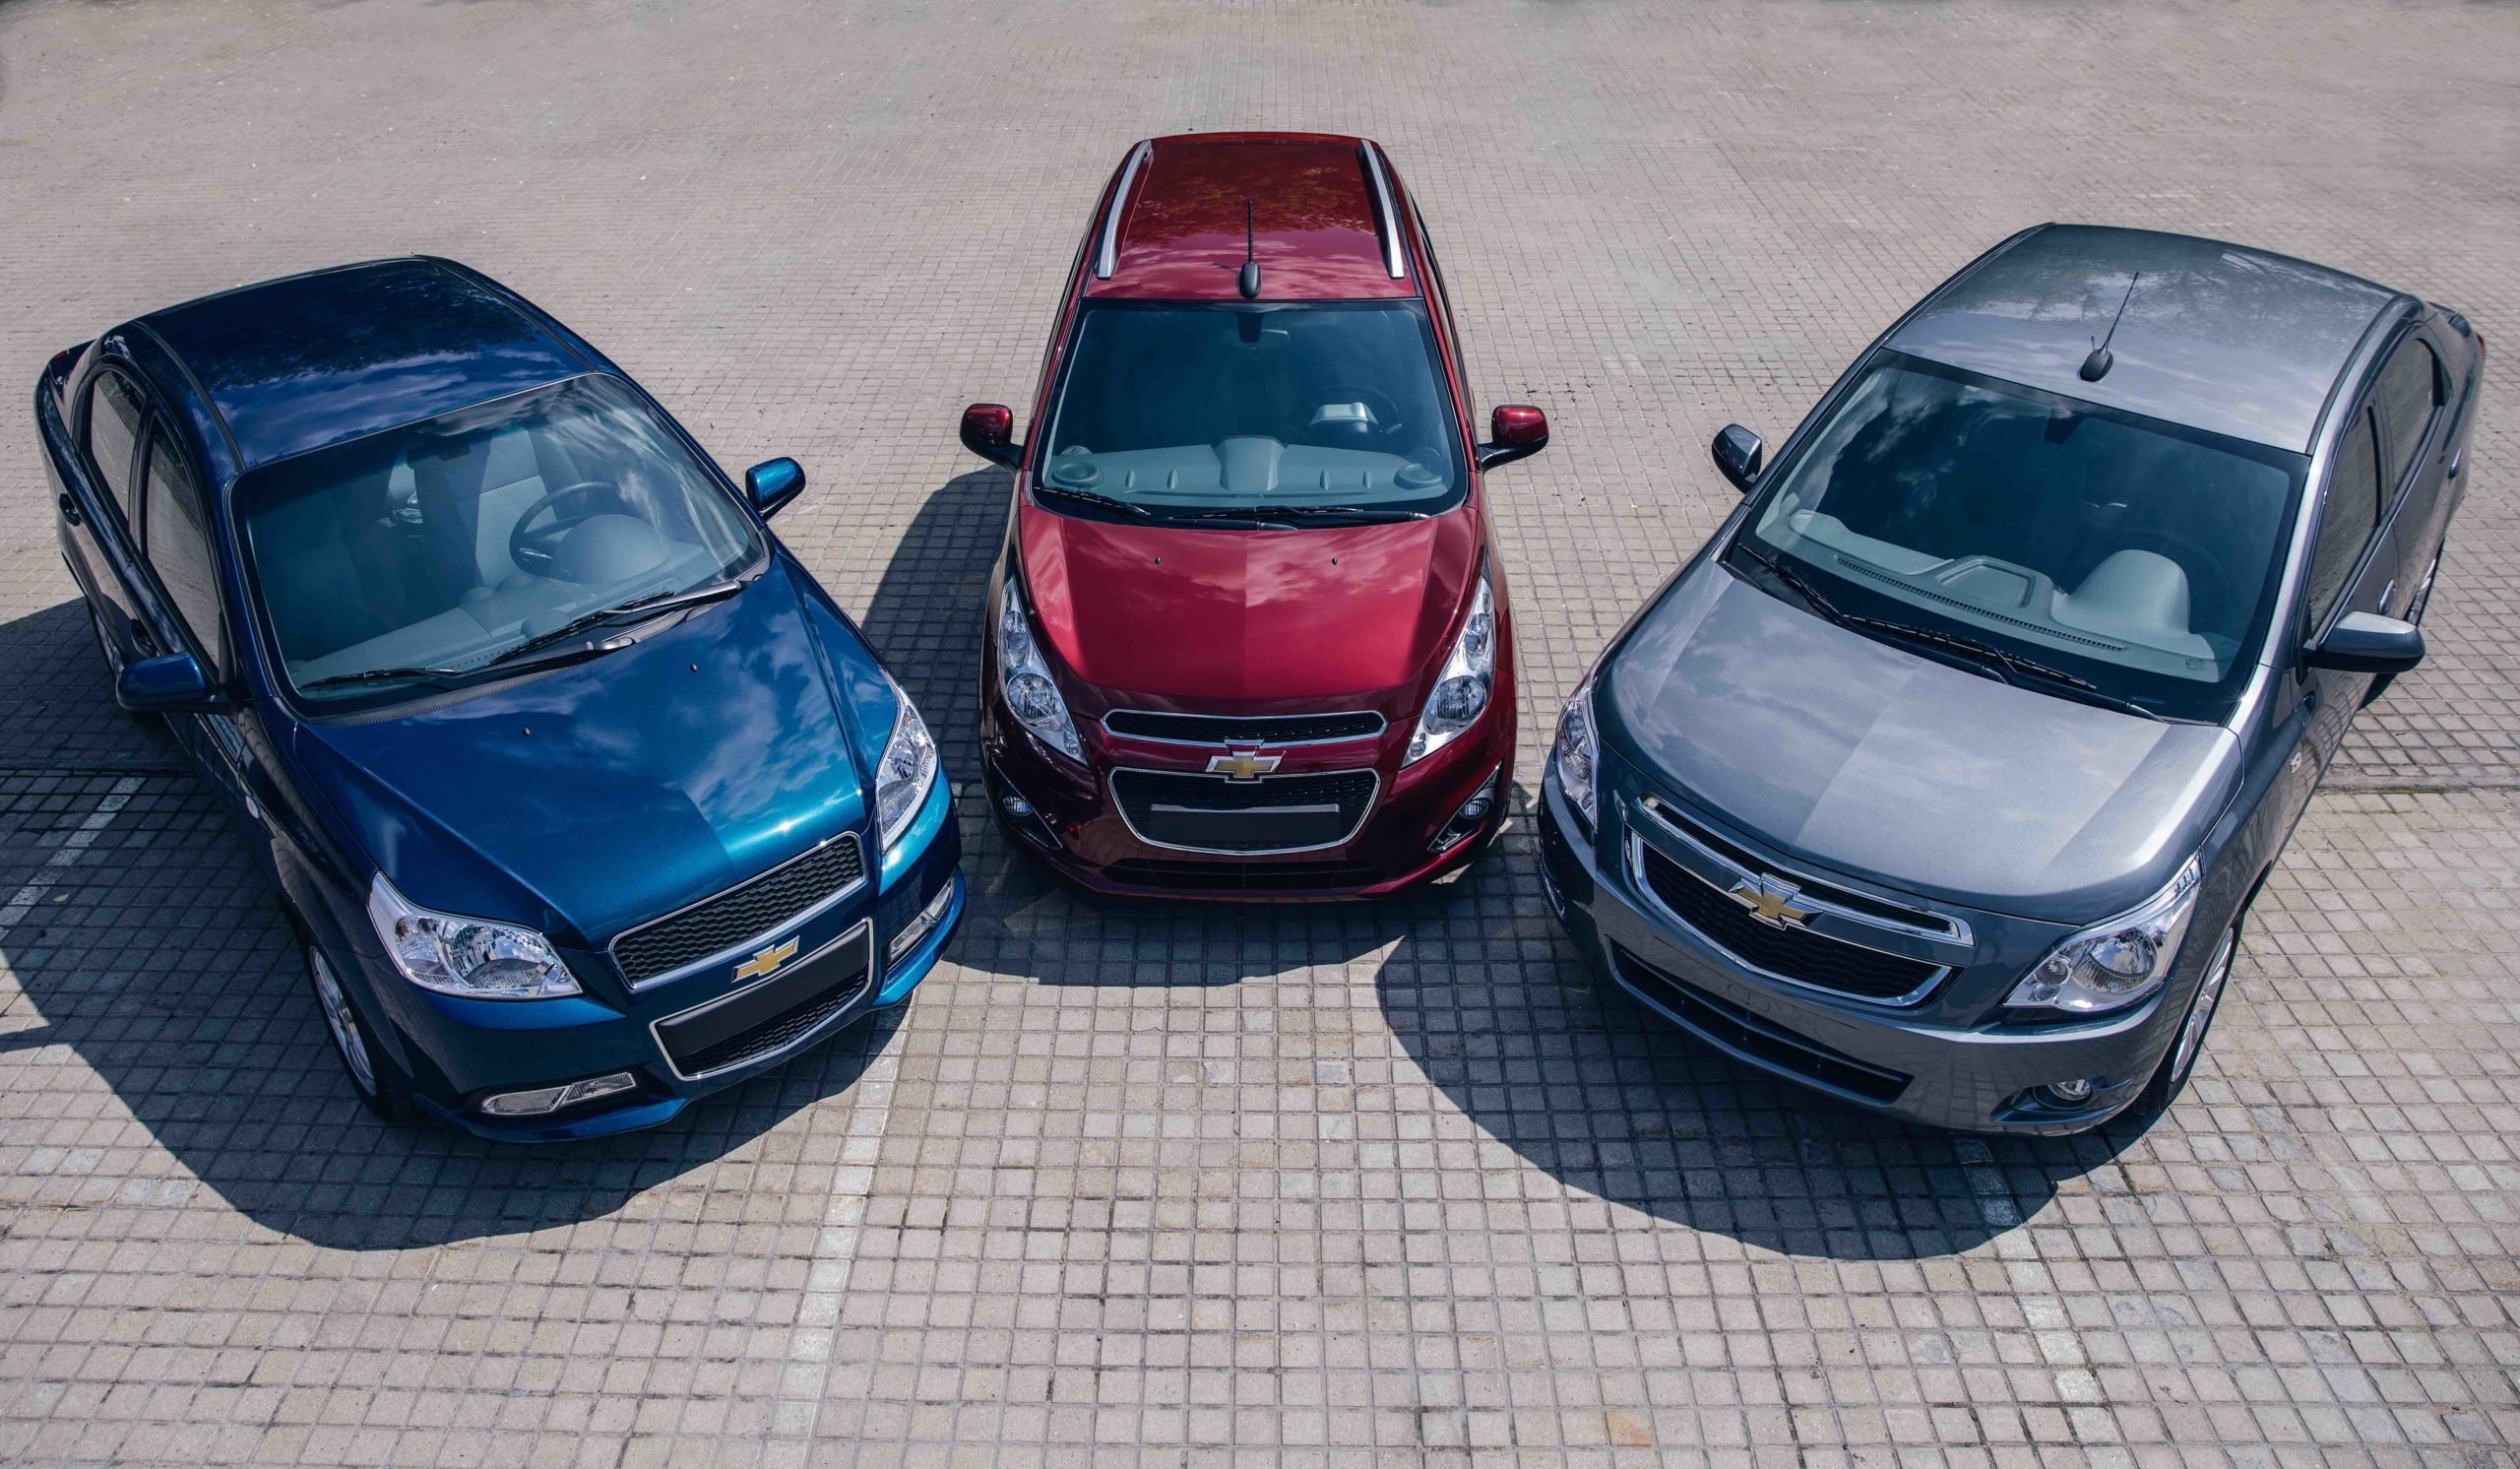 Модели Chevrolet массового сегмента стали дороже